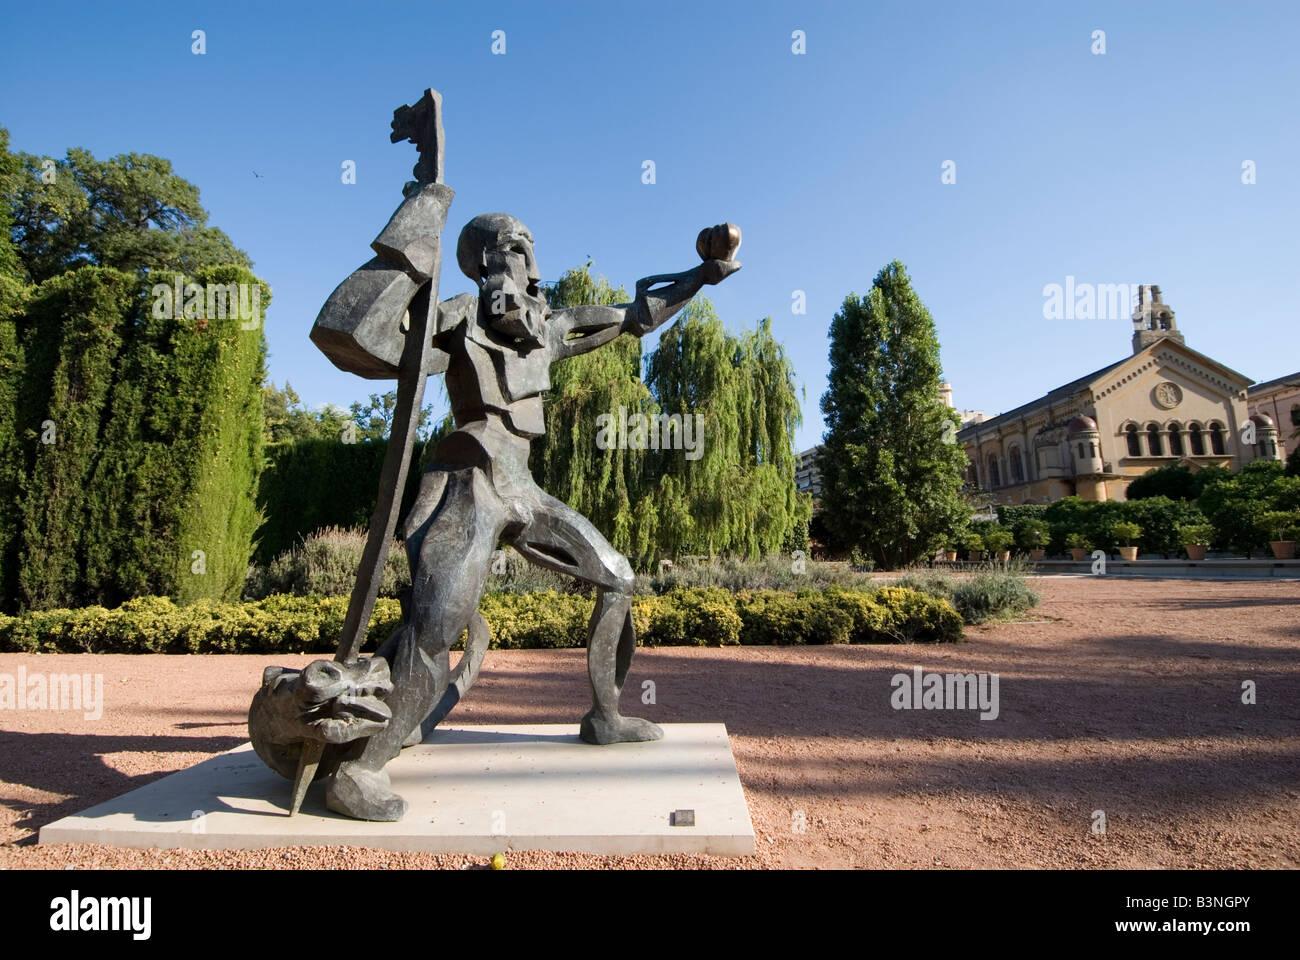 Sculpture in Jardin de las Hesperides park in Valencia Spain - Stock Image